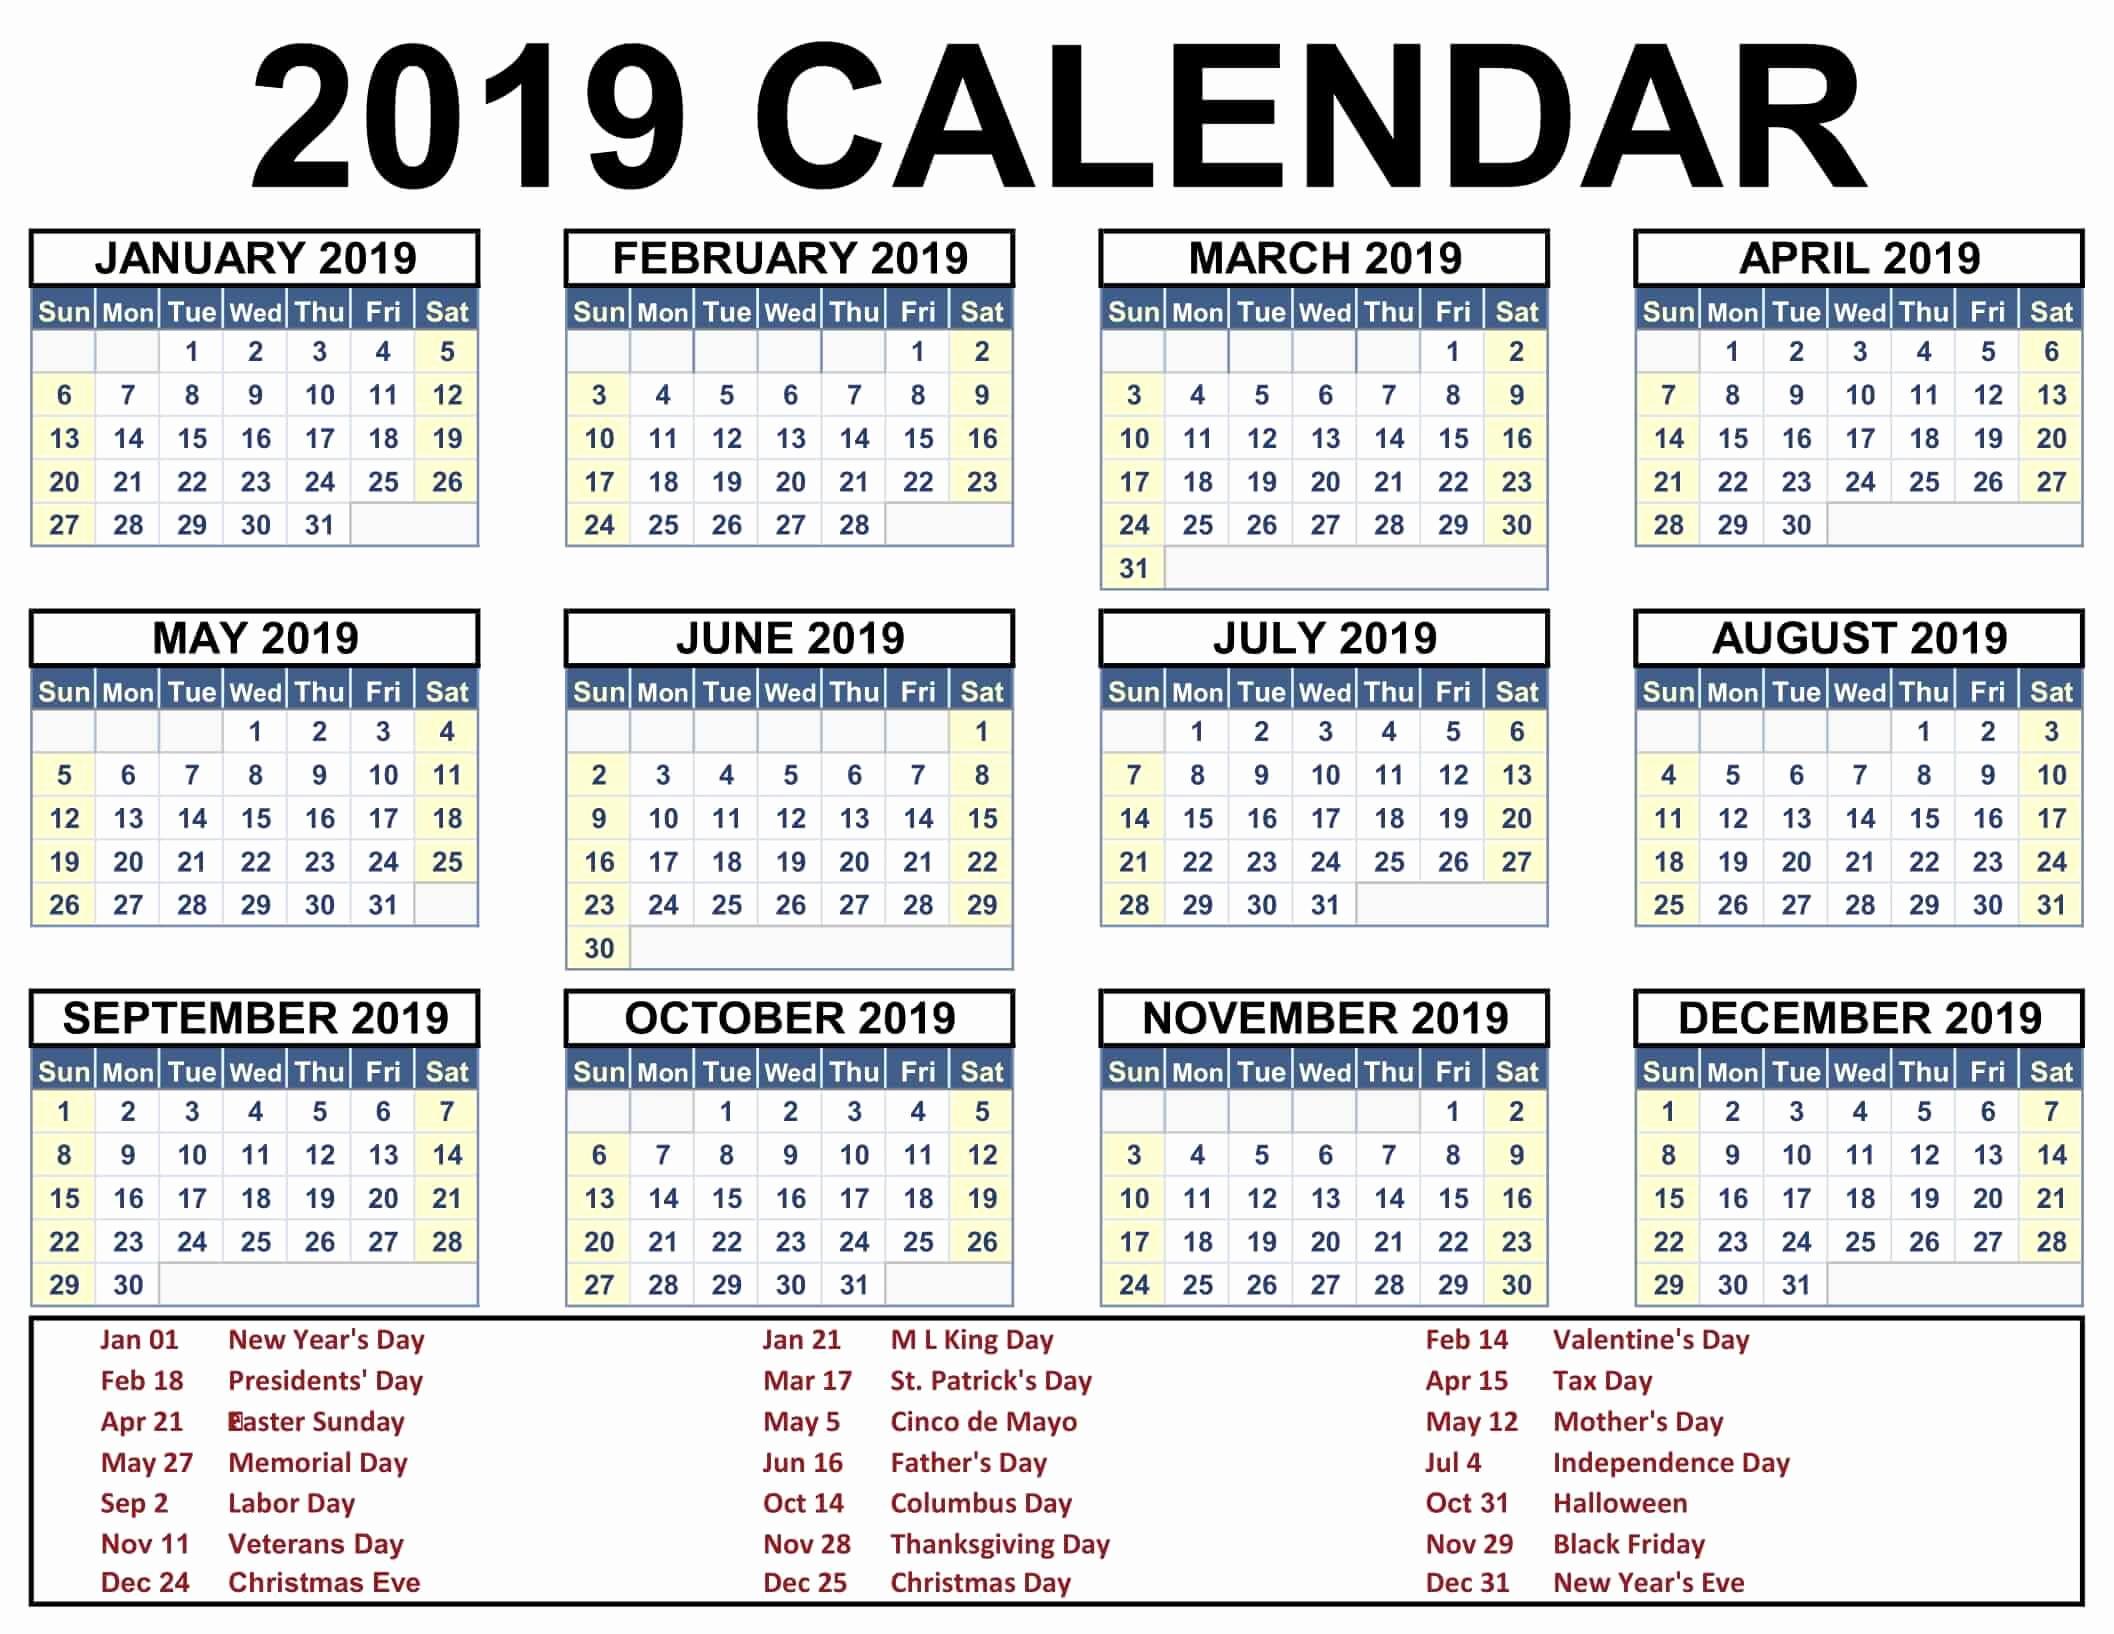 Luxury 32 Examples Hanukkah 2019 2020 Calendar | Etxettipia